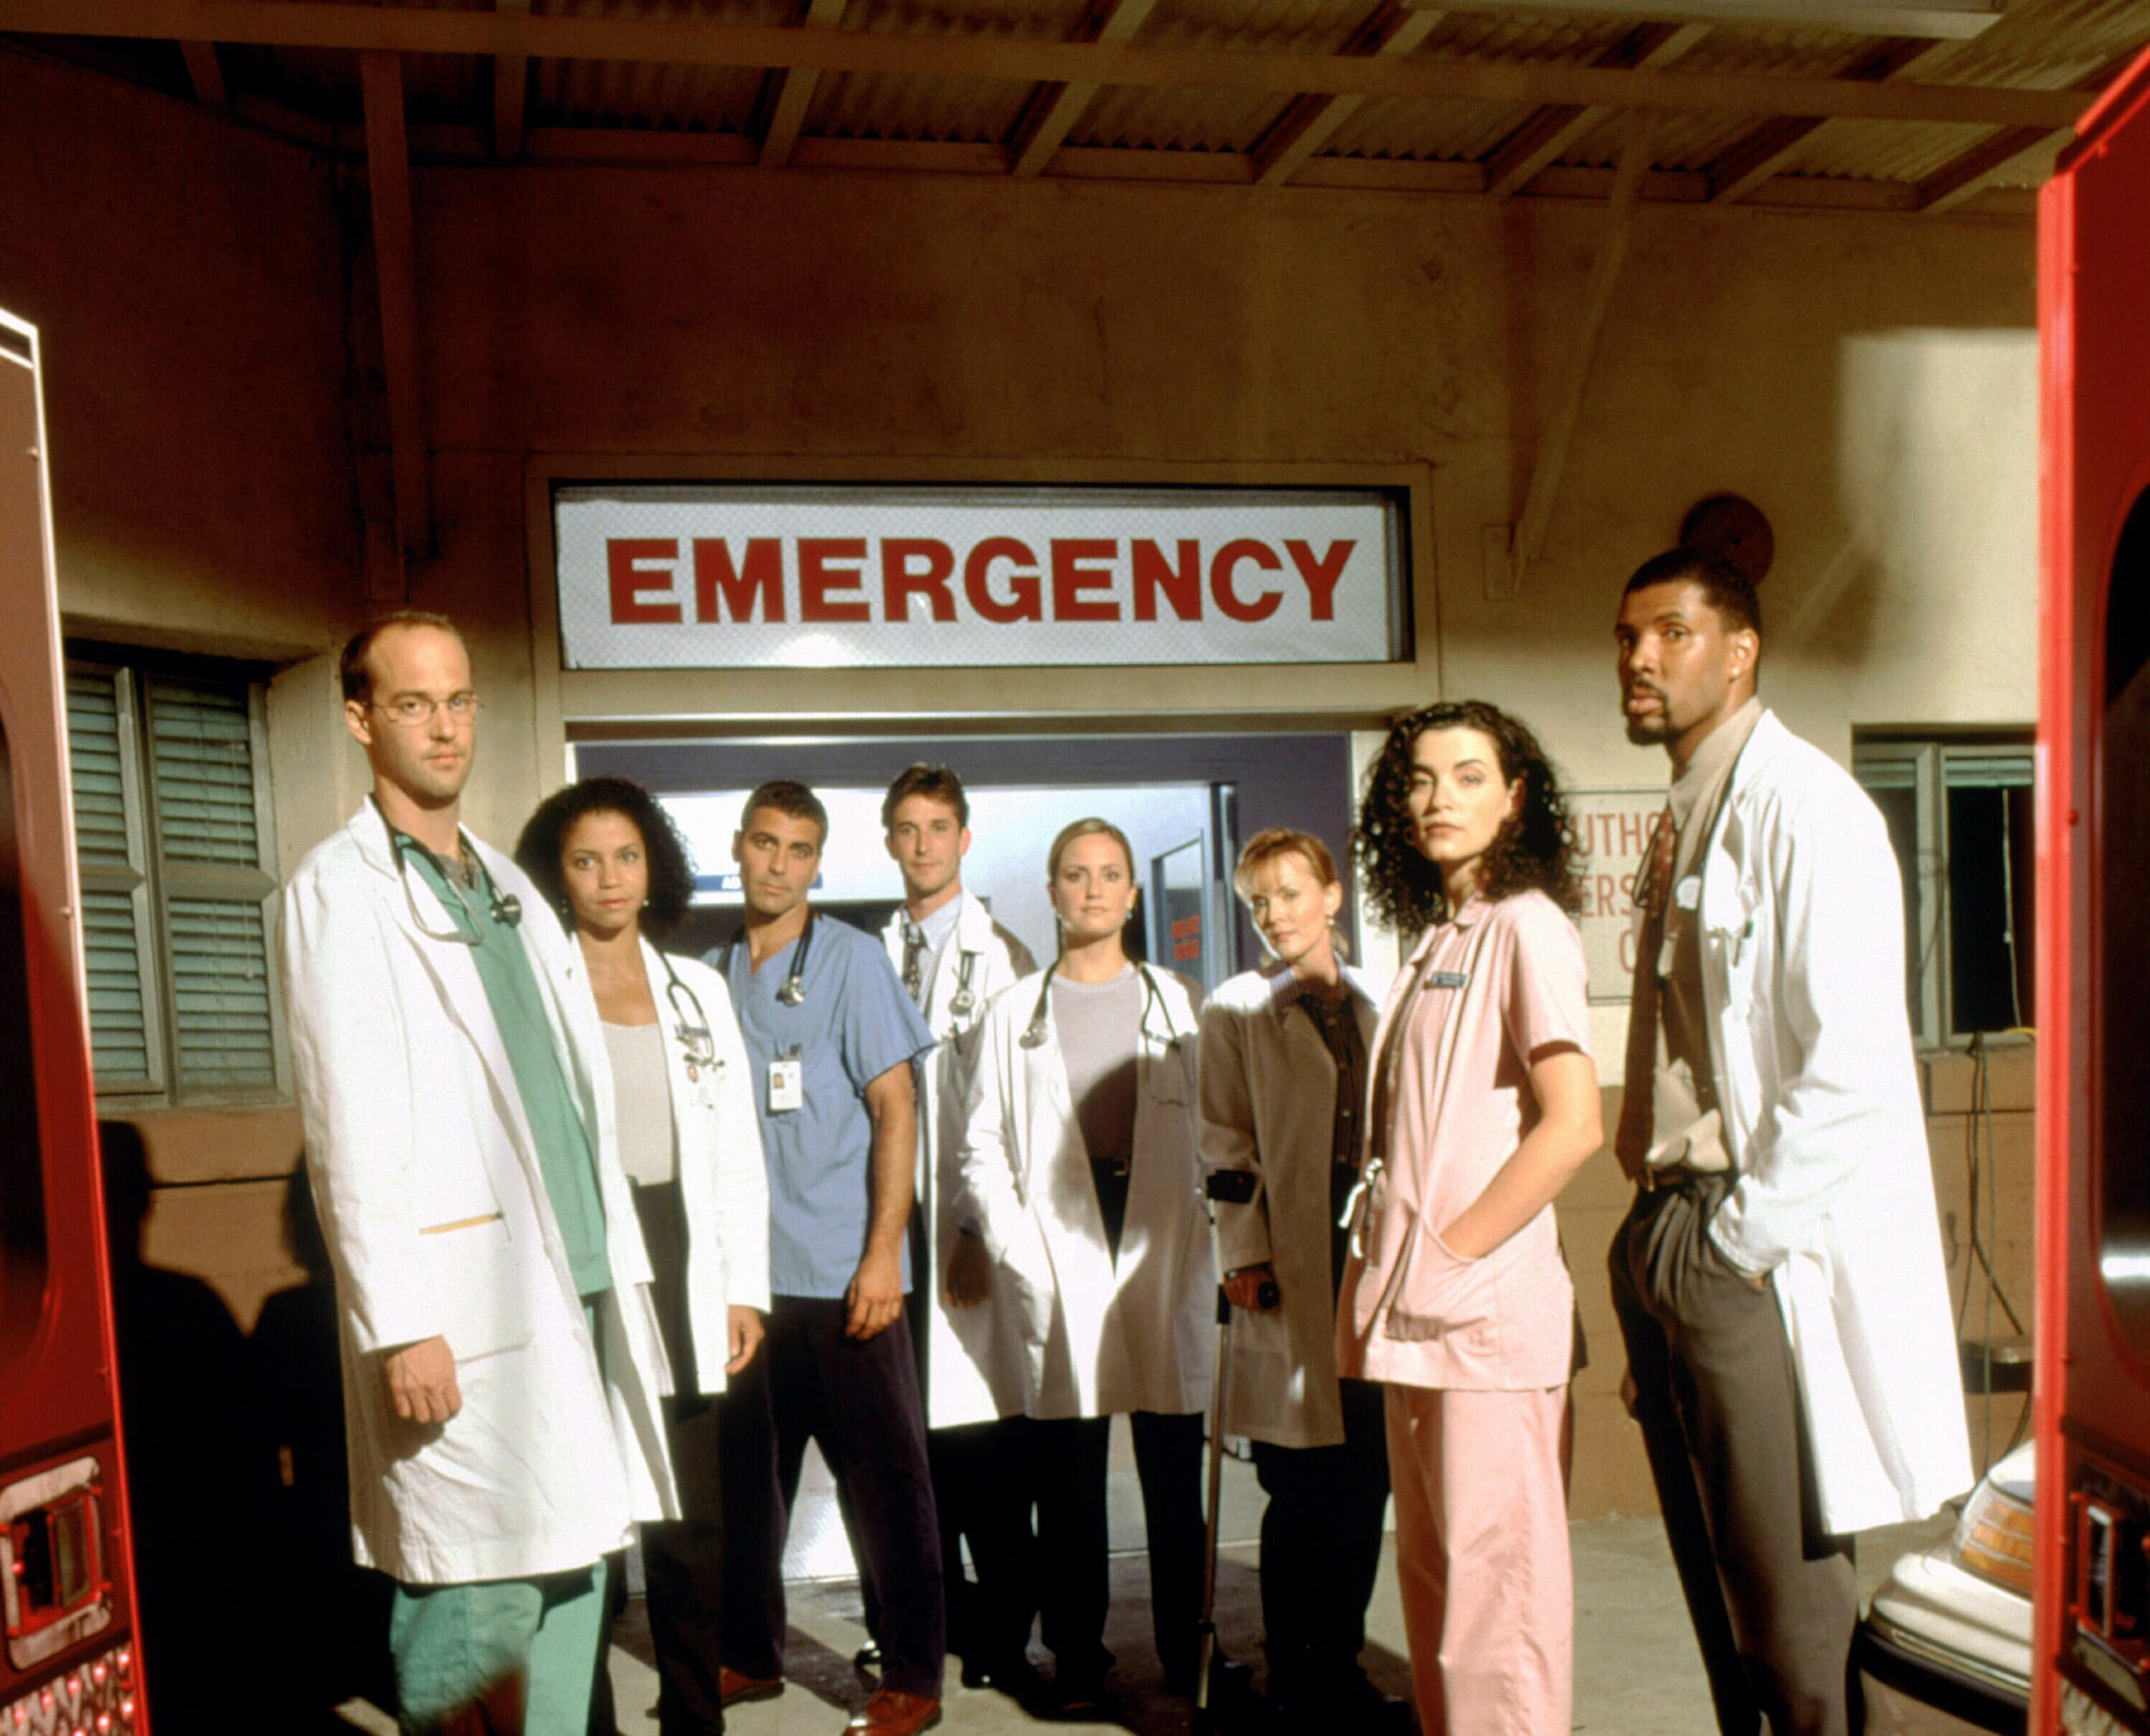 ER, Anthony Edwards, Gloria Reuben, George Clooney, Noah Wyle, Sherry Stringfield, Laura Innes, Julianna Margulies, Eriq La Salle, (Season 3)